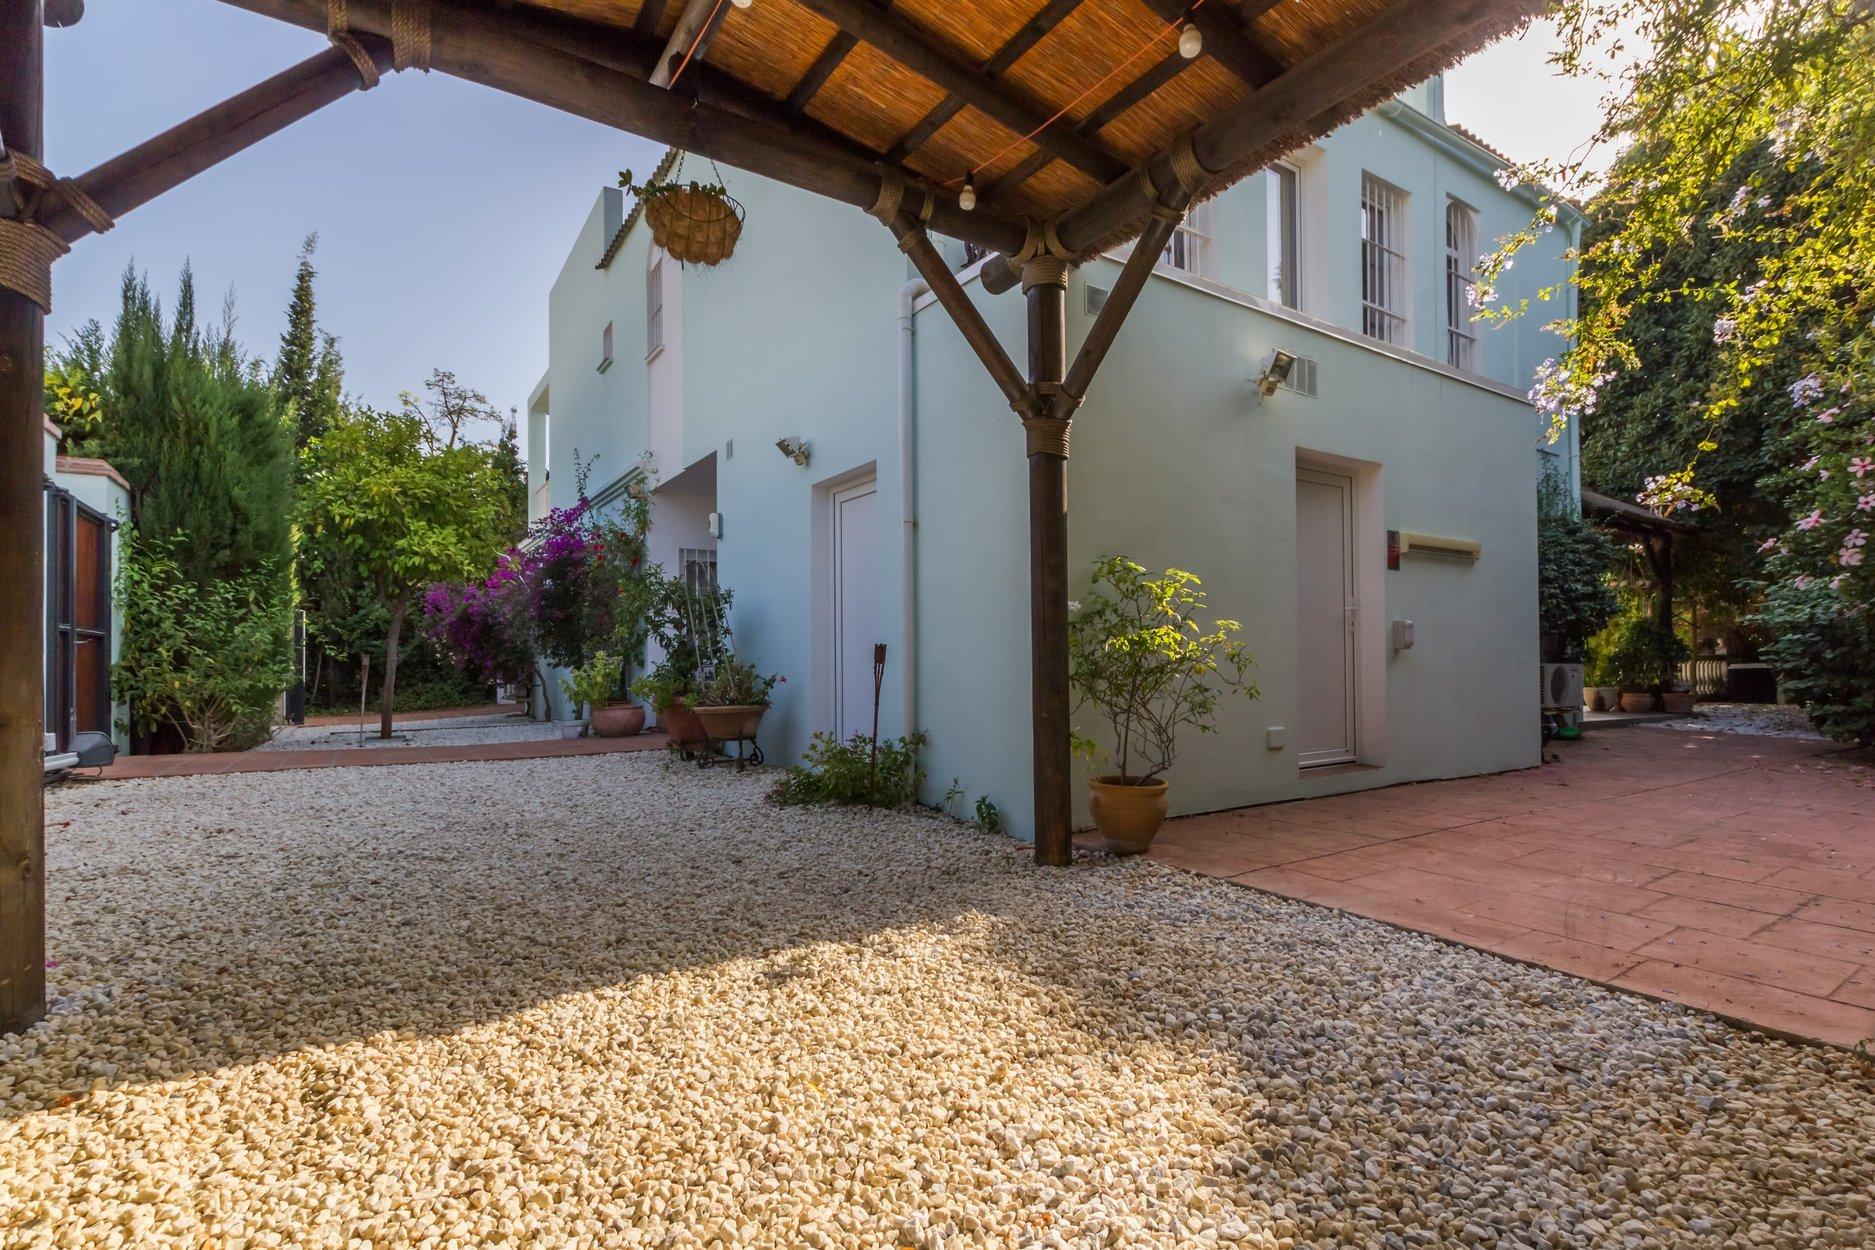 VillaLagomar, i Lagomar, Nueva Andalucia, Marbella